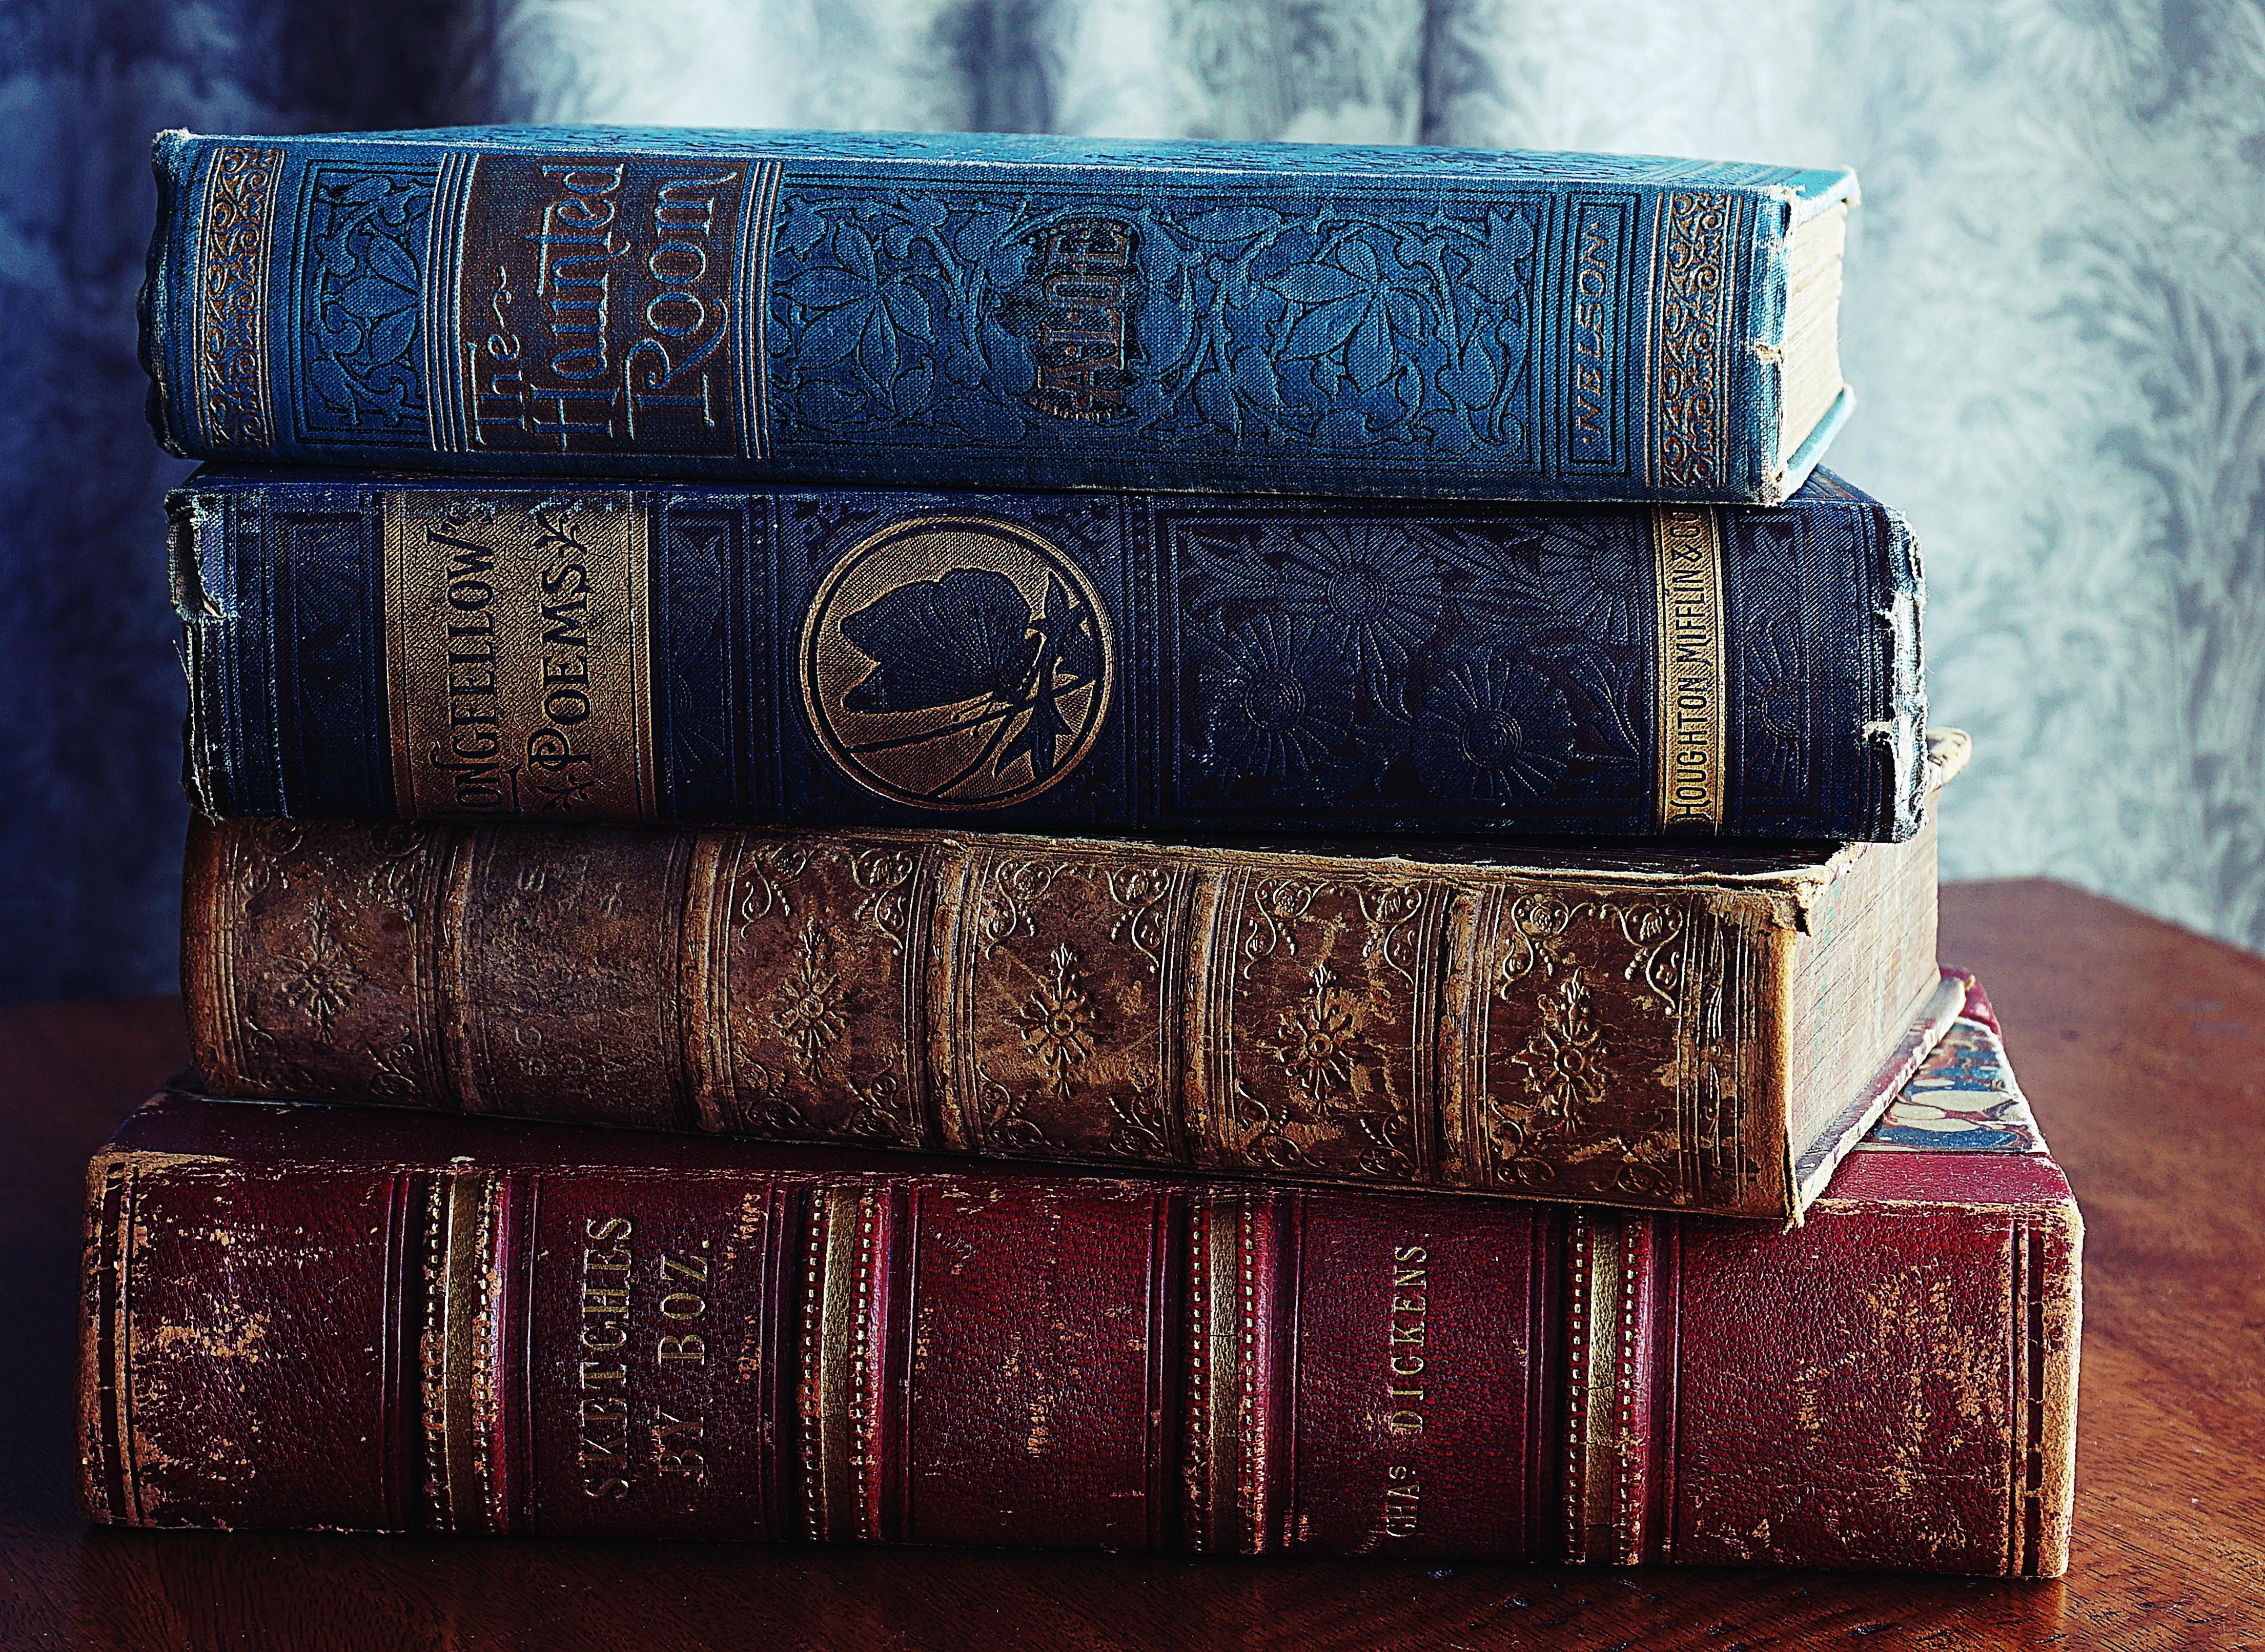 нужен книги на фоне истории любовники засунули два